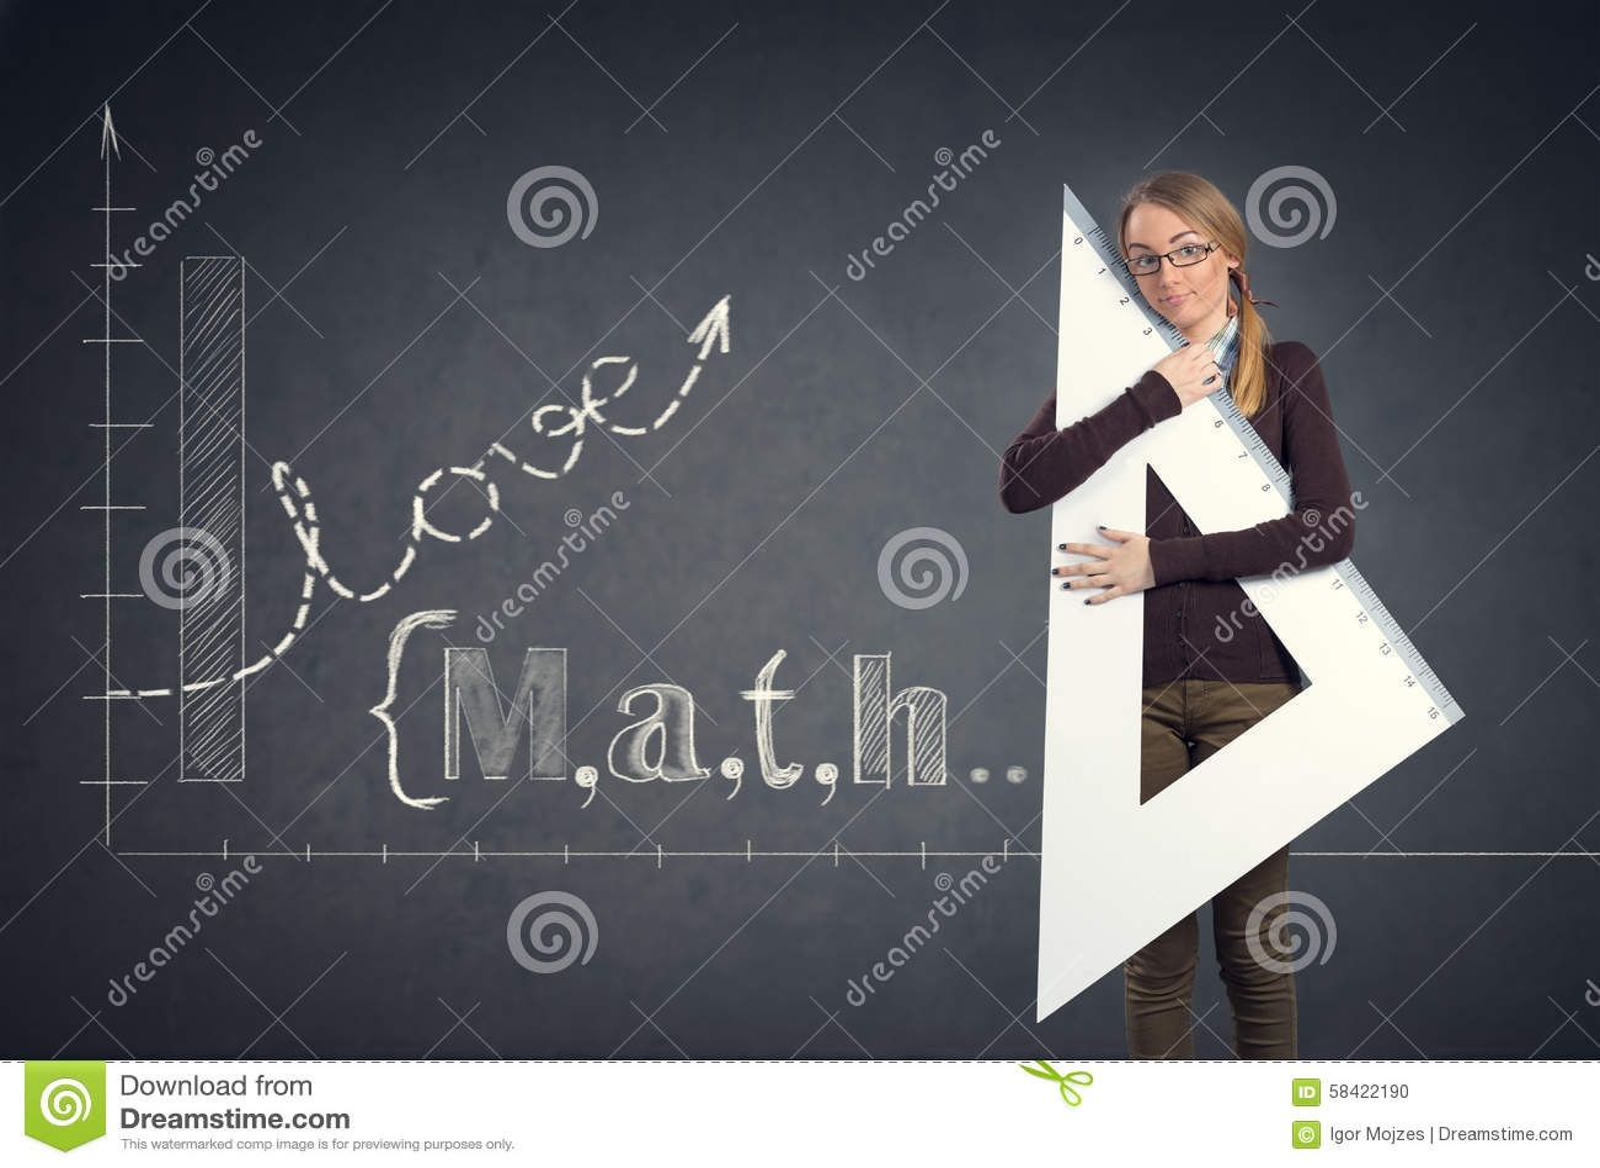 Student loves math stock photo. Image of lesson, mathematics - 58422190